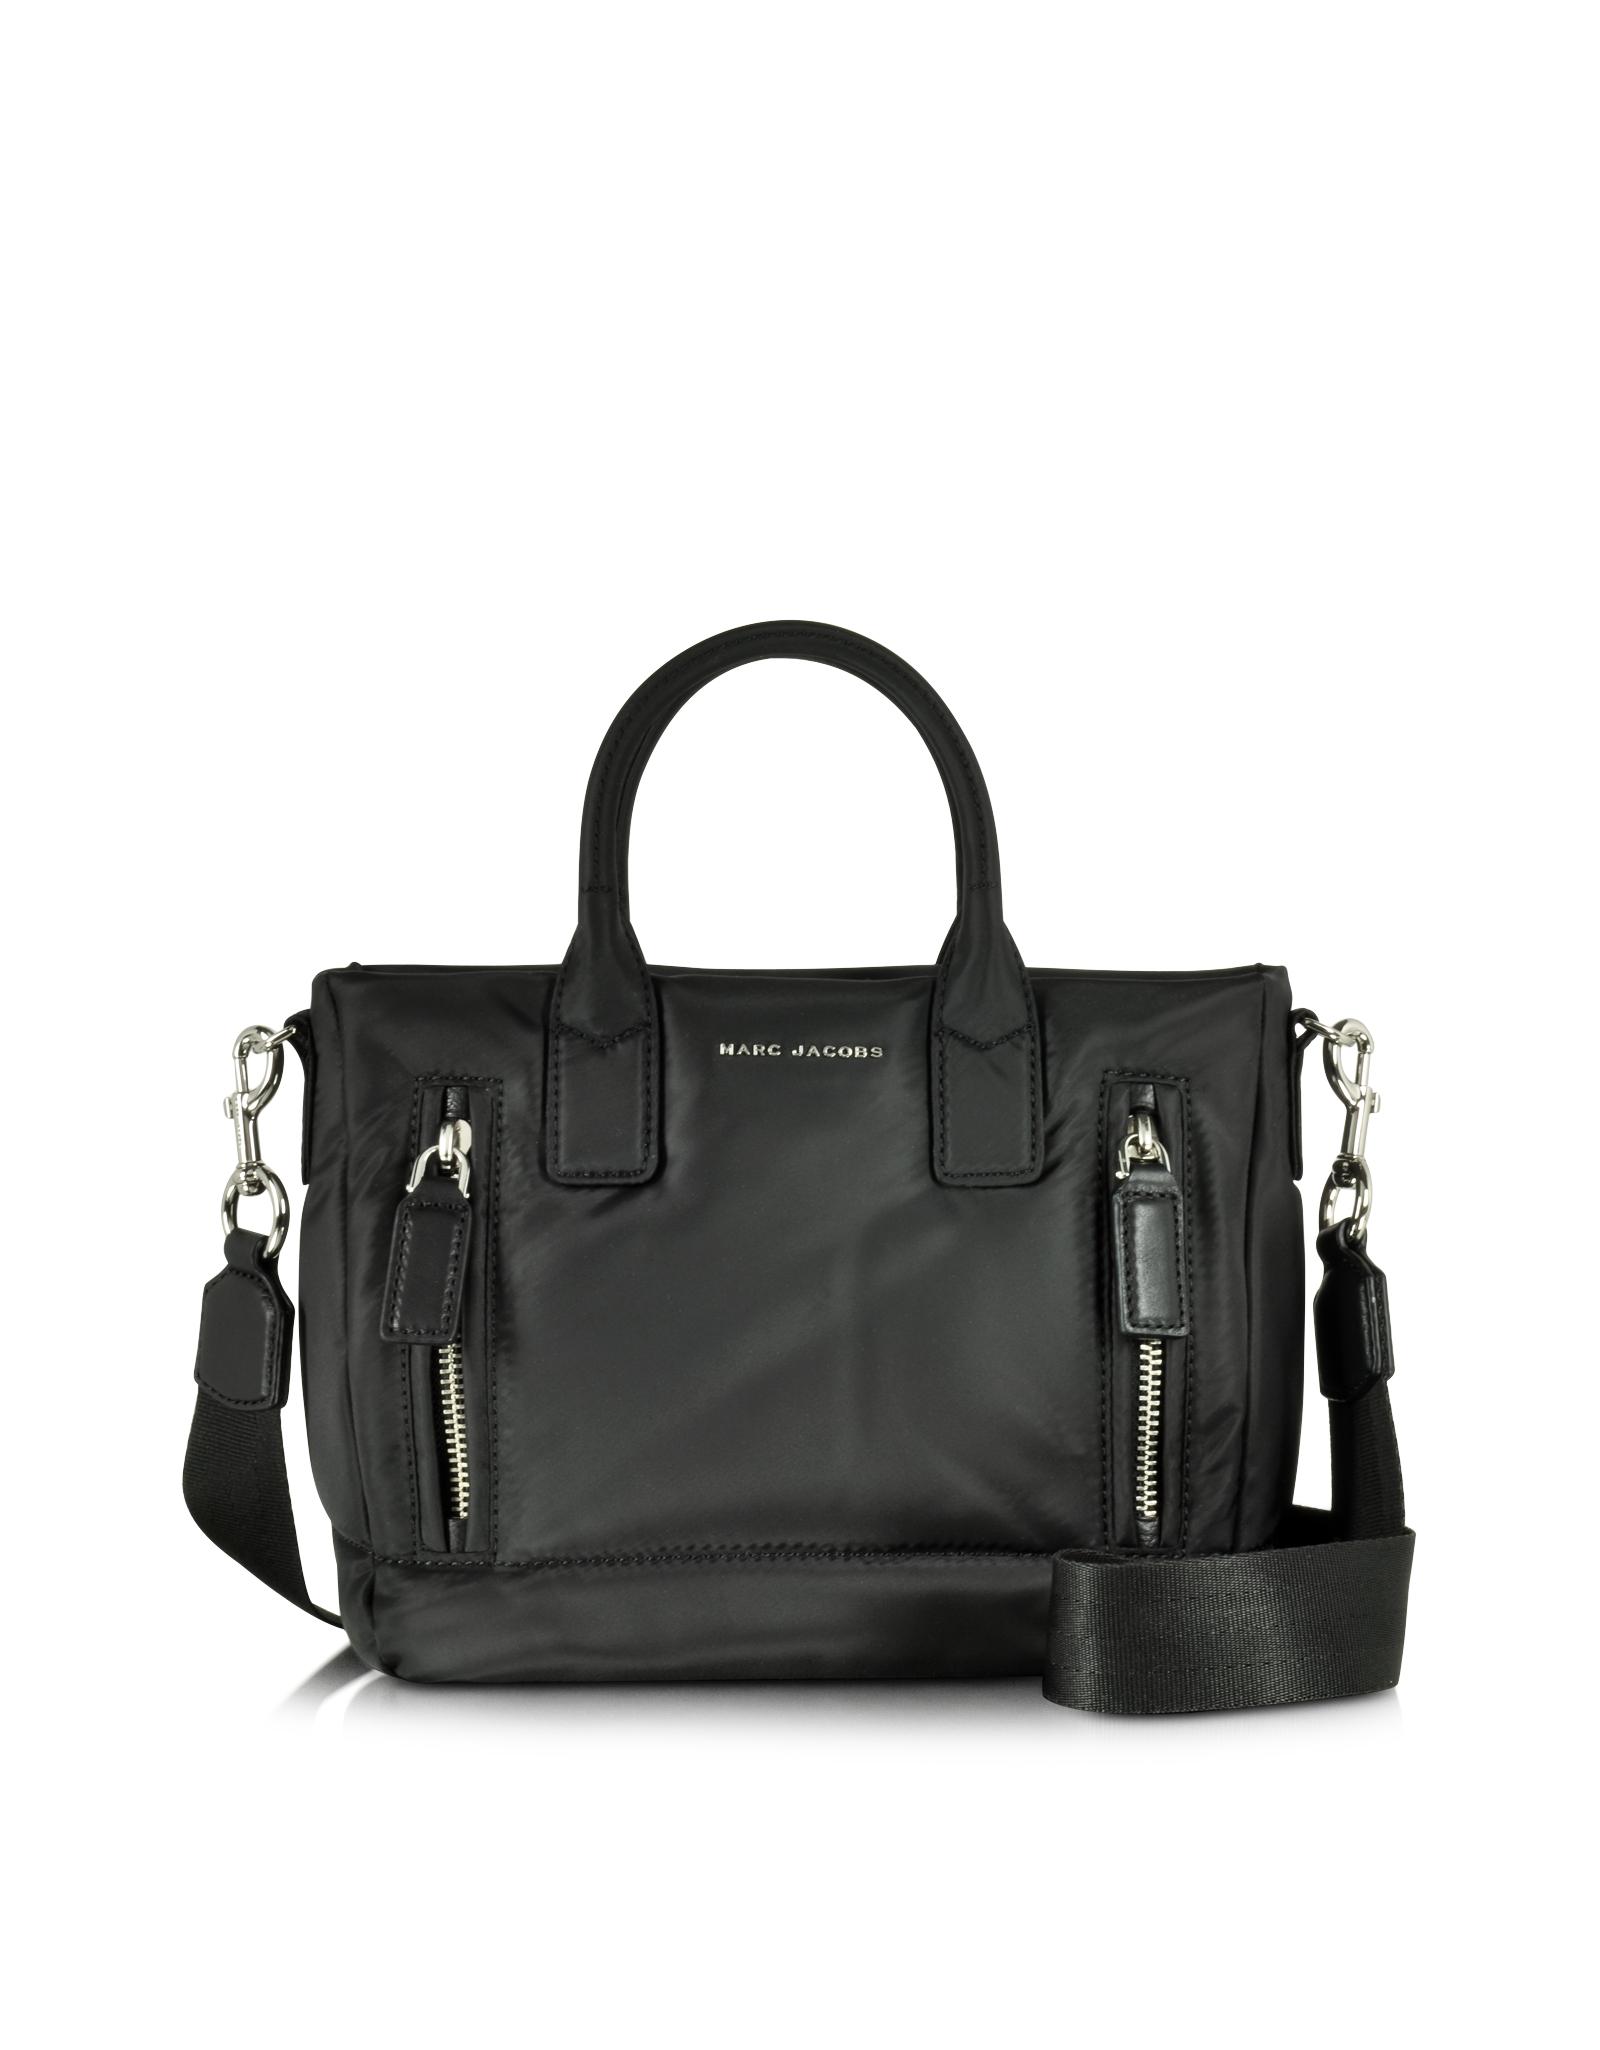 Marc Jacobs Nylon Tote Bags - Polyvore